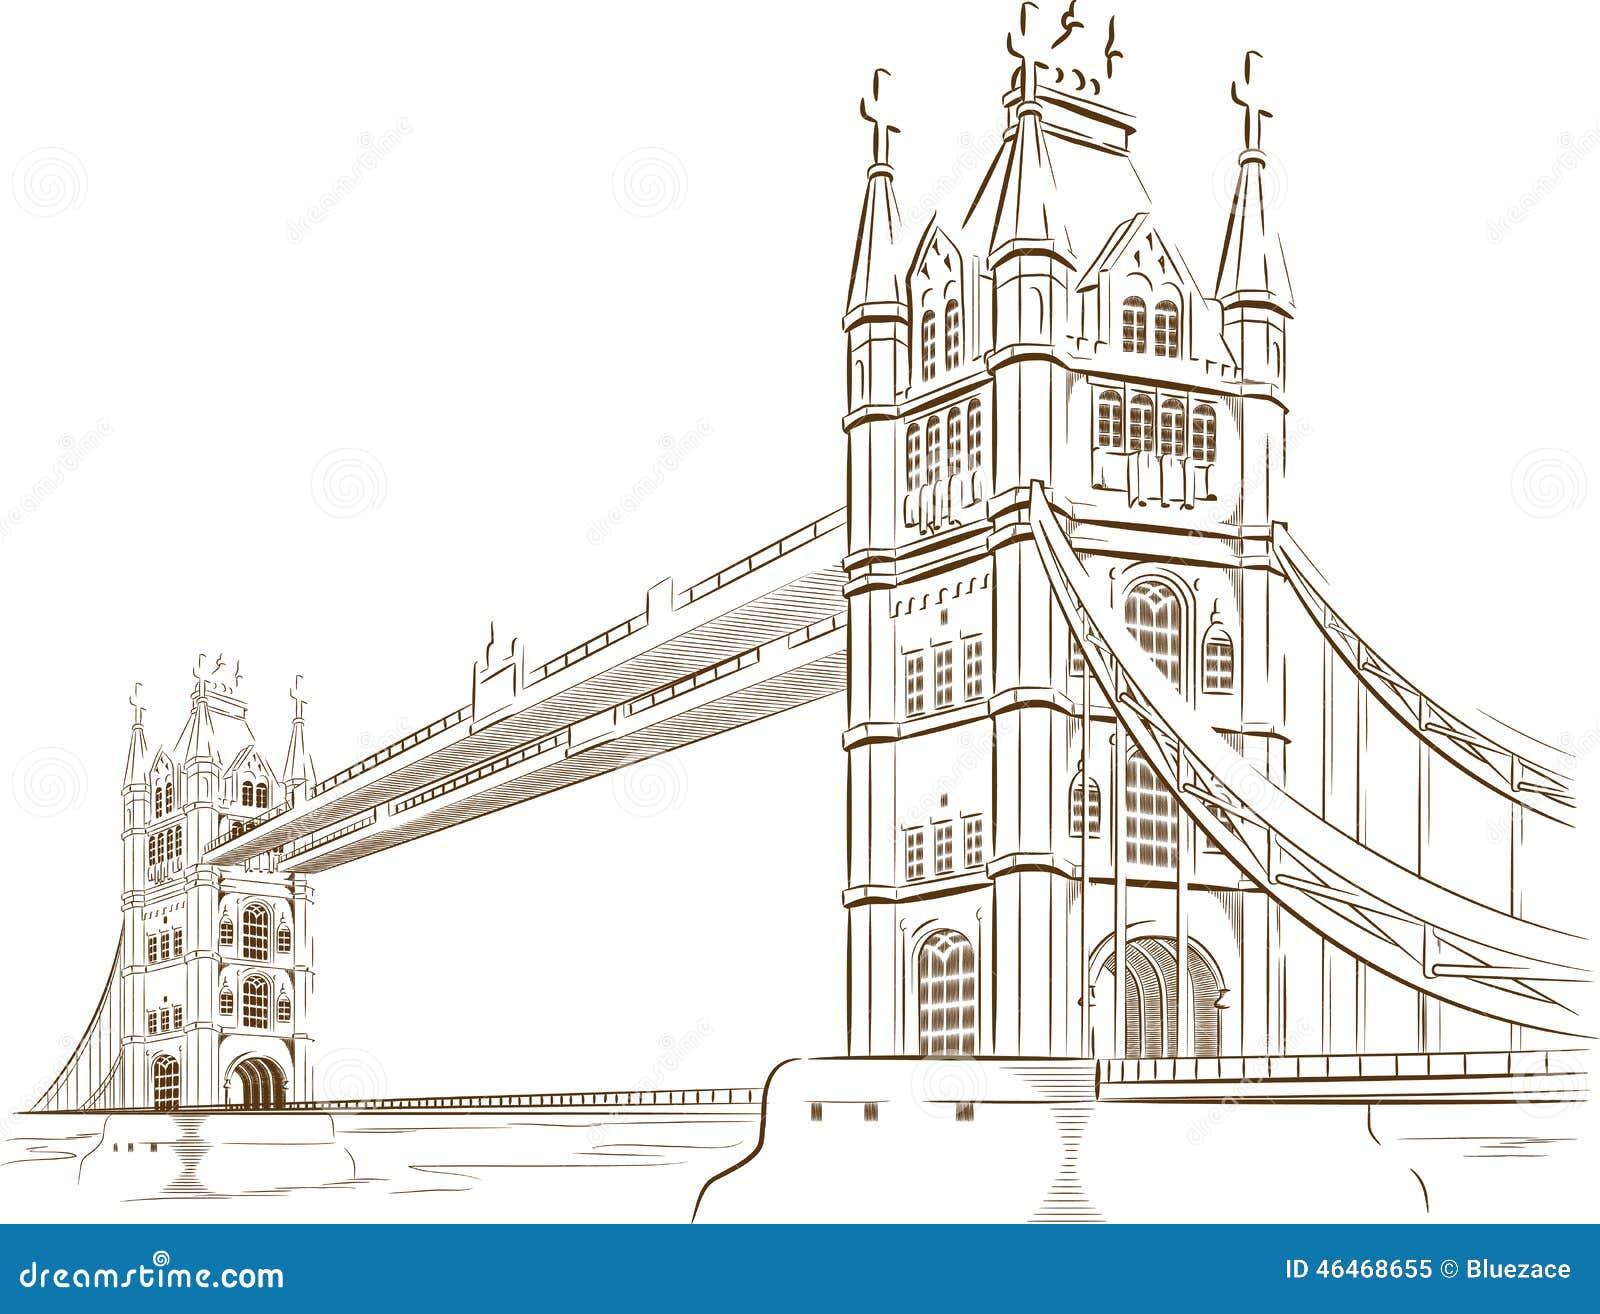 Sketch of british tourism landmark london bridge stock for Design bridge london